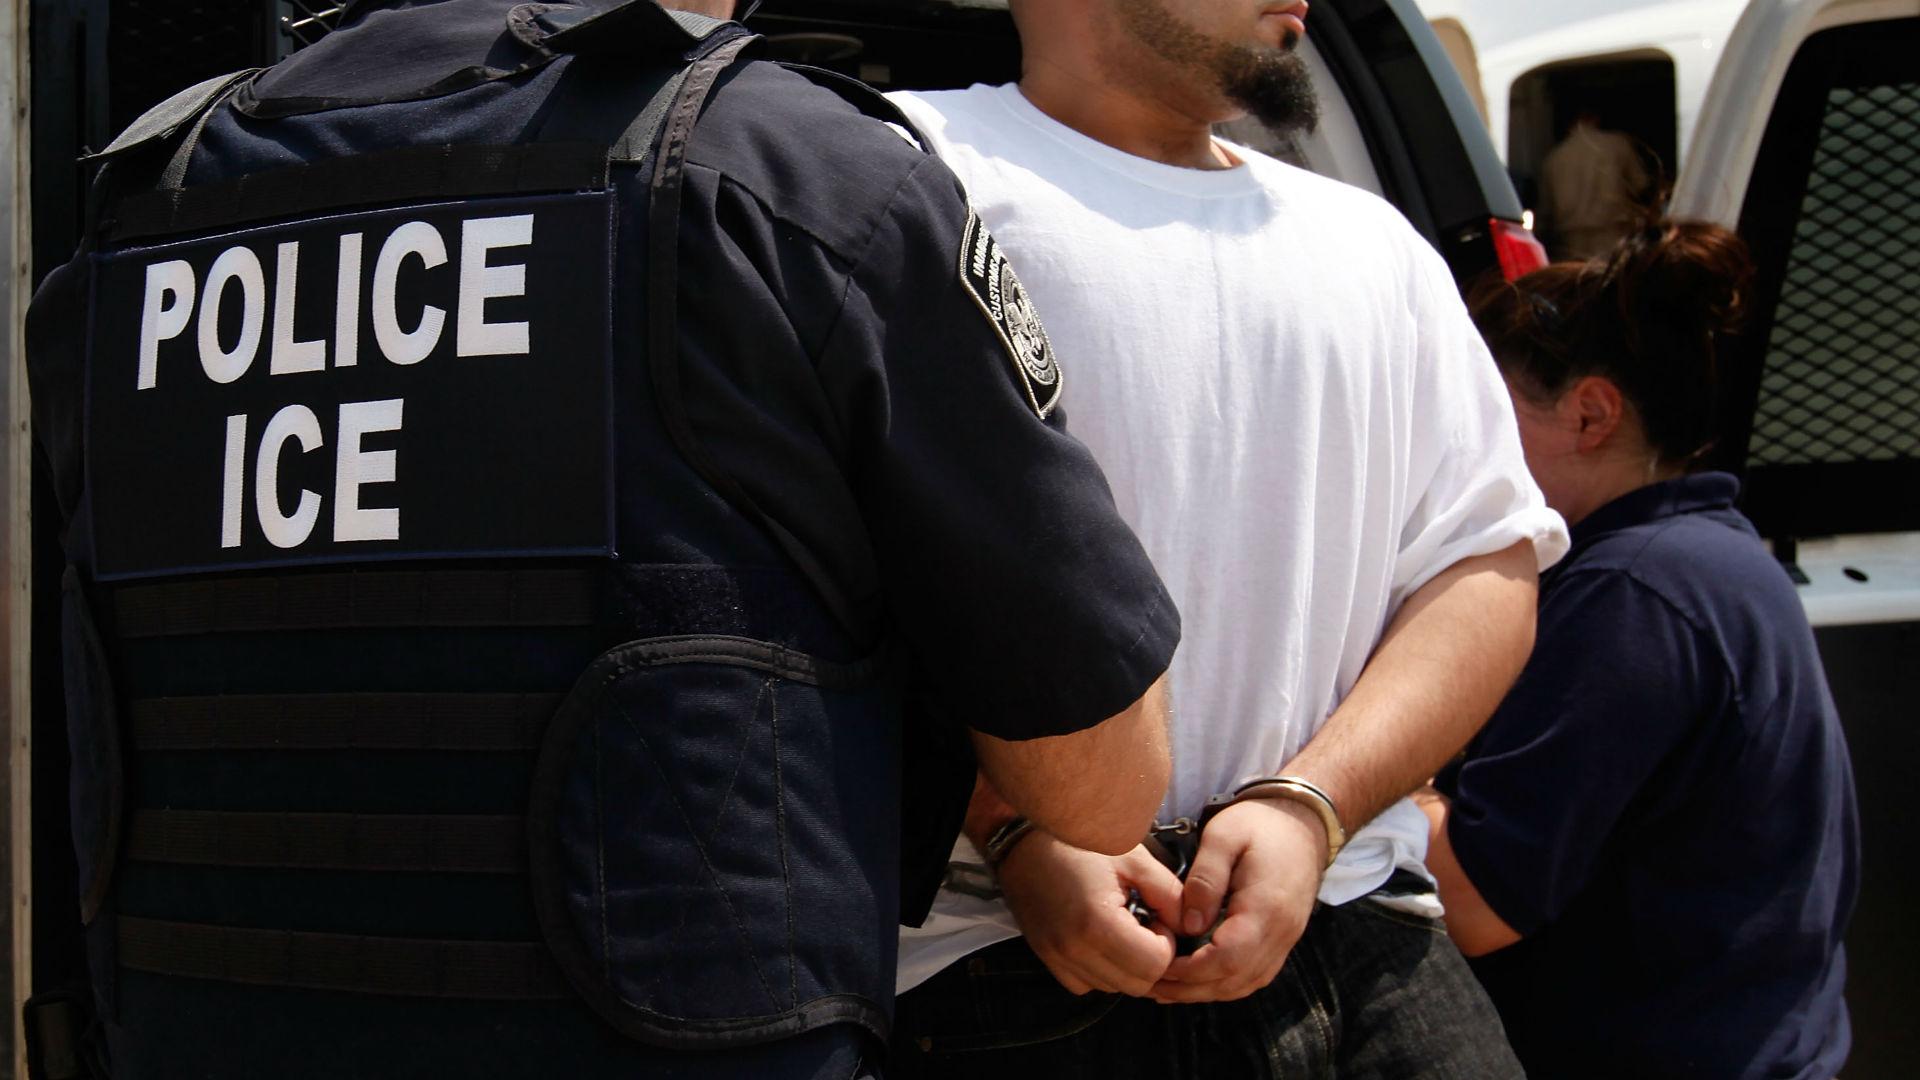 immigration agents arrest 114 - HD1500×1125